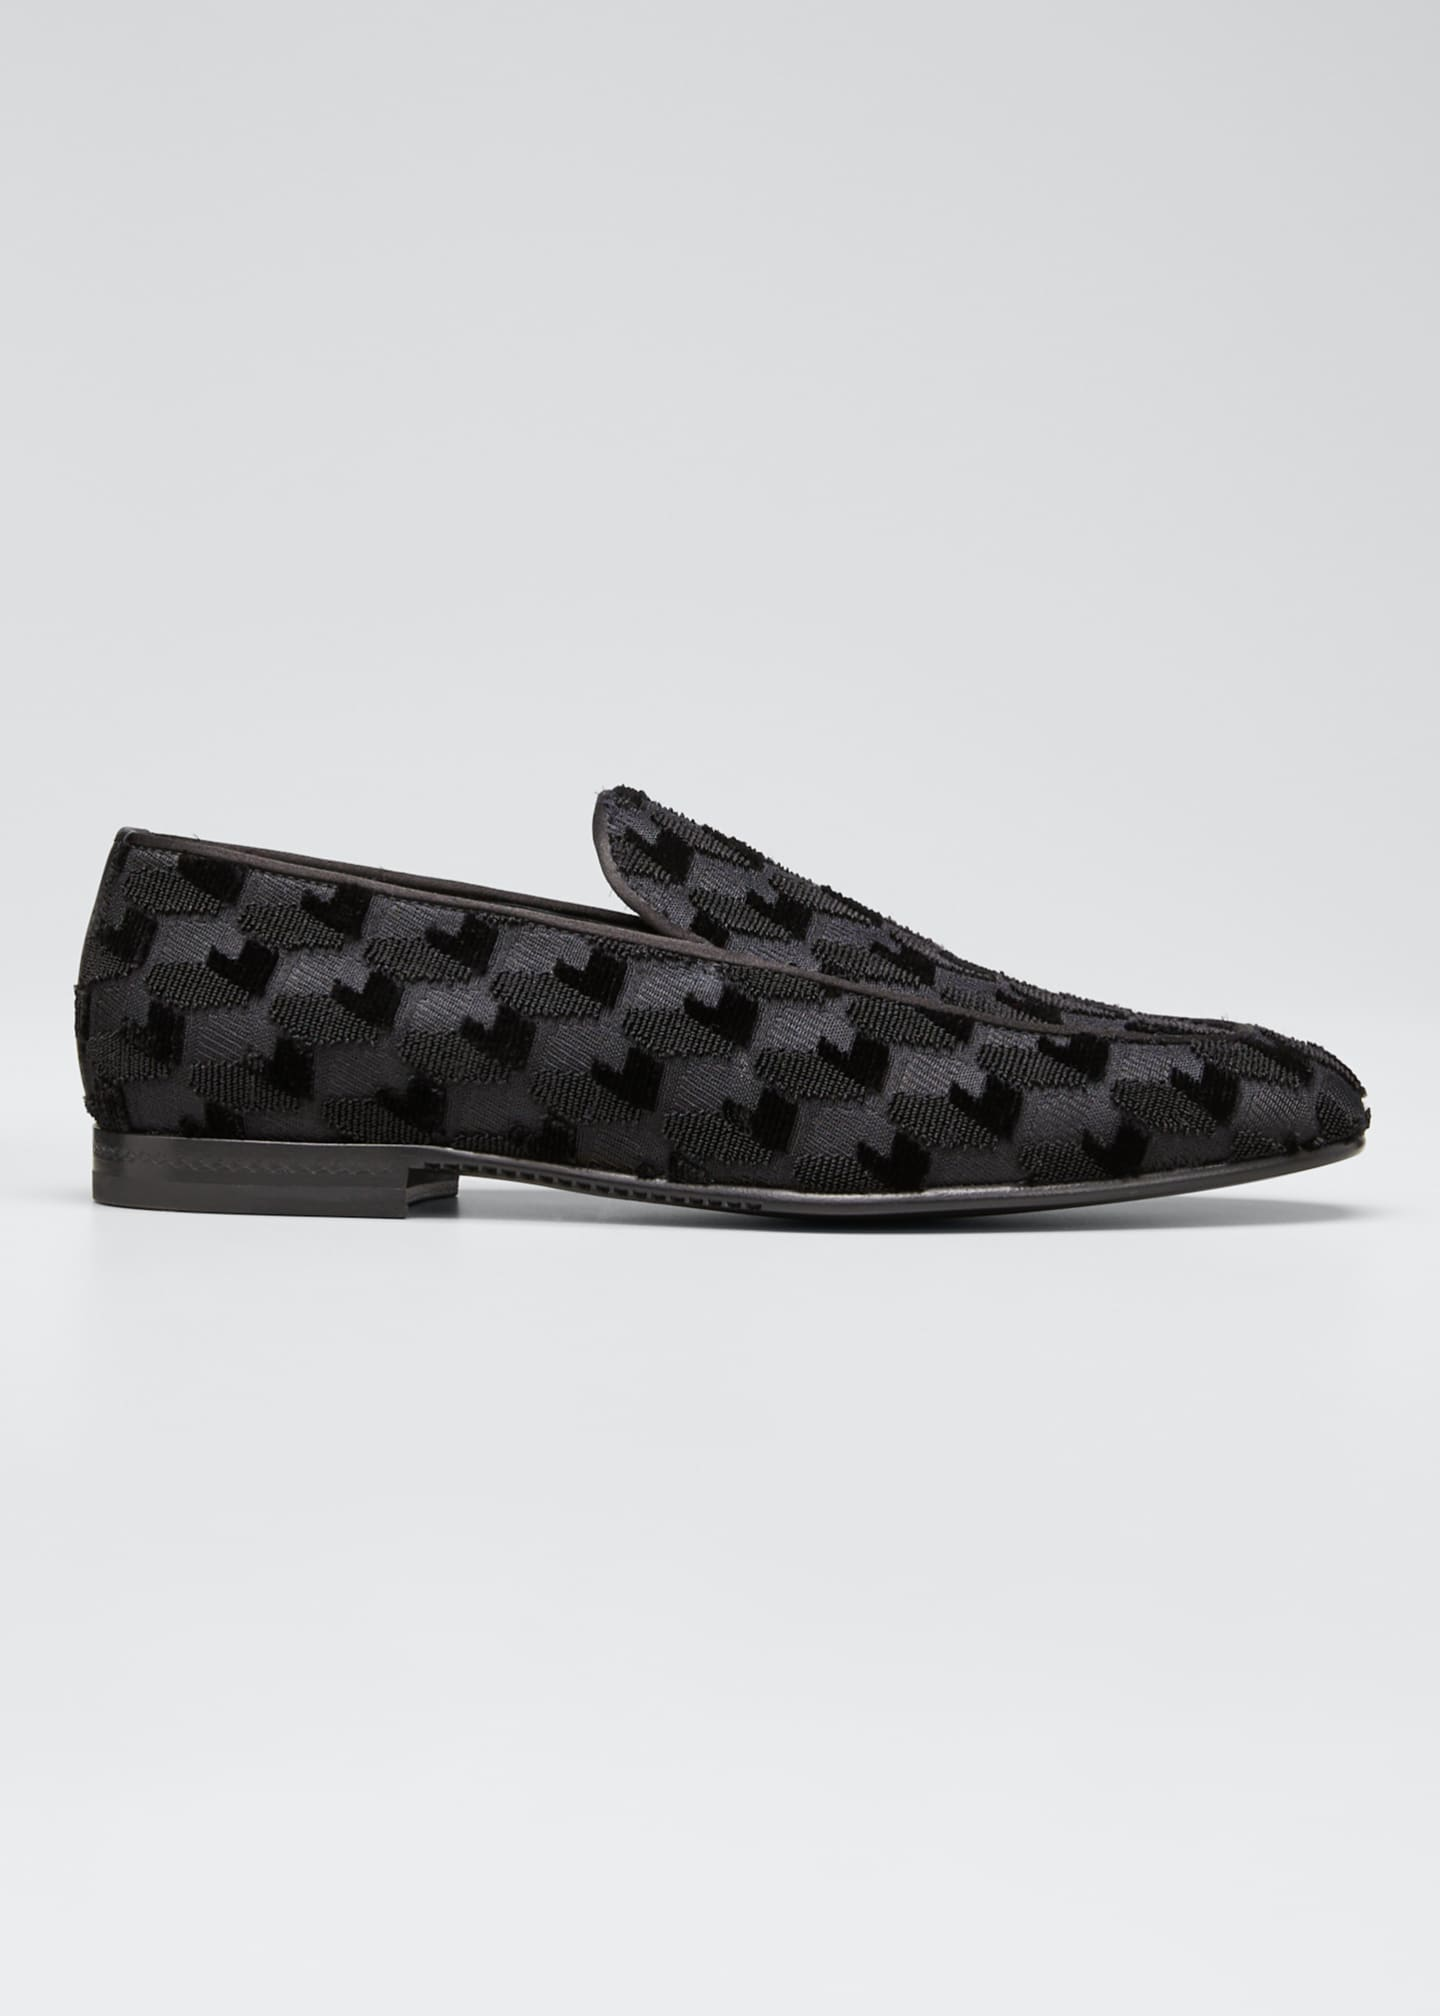 Ermenegildo Zegna Men's Lido Textured Evening Loafers